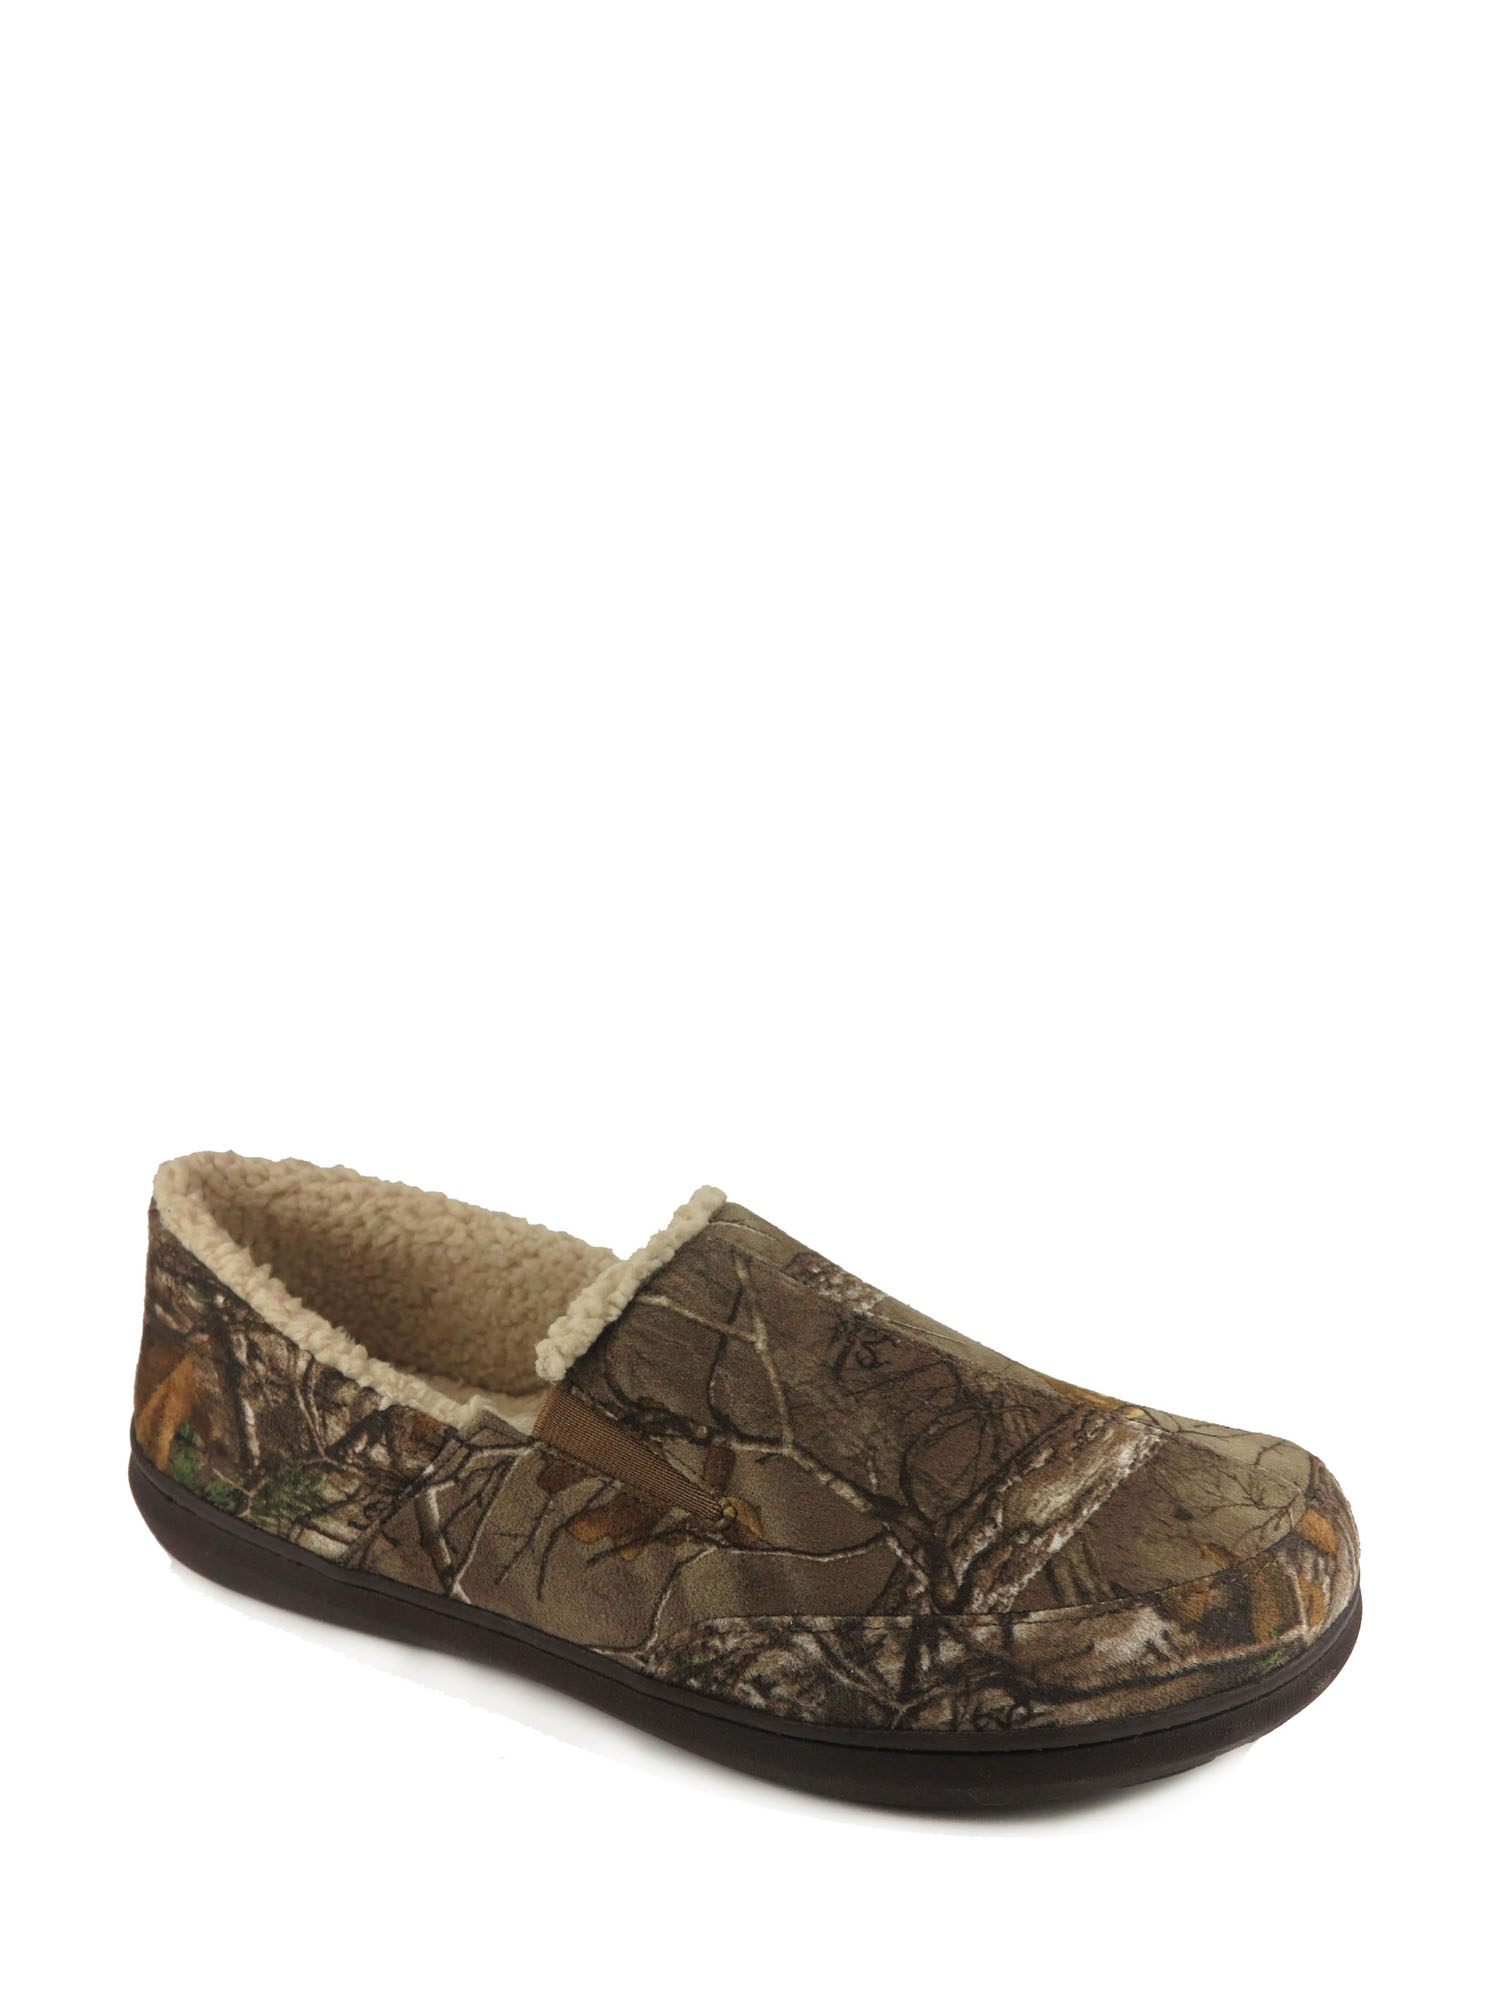 Wrangler Realtree Xtra Mens Casual Shoes Memory Foam S 8.5 Camo Camouflage